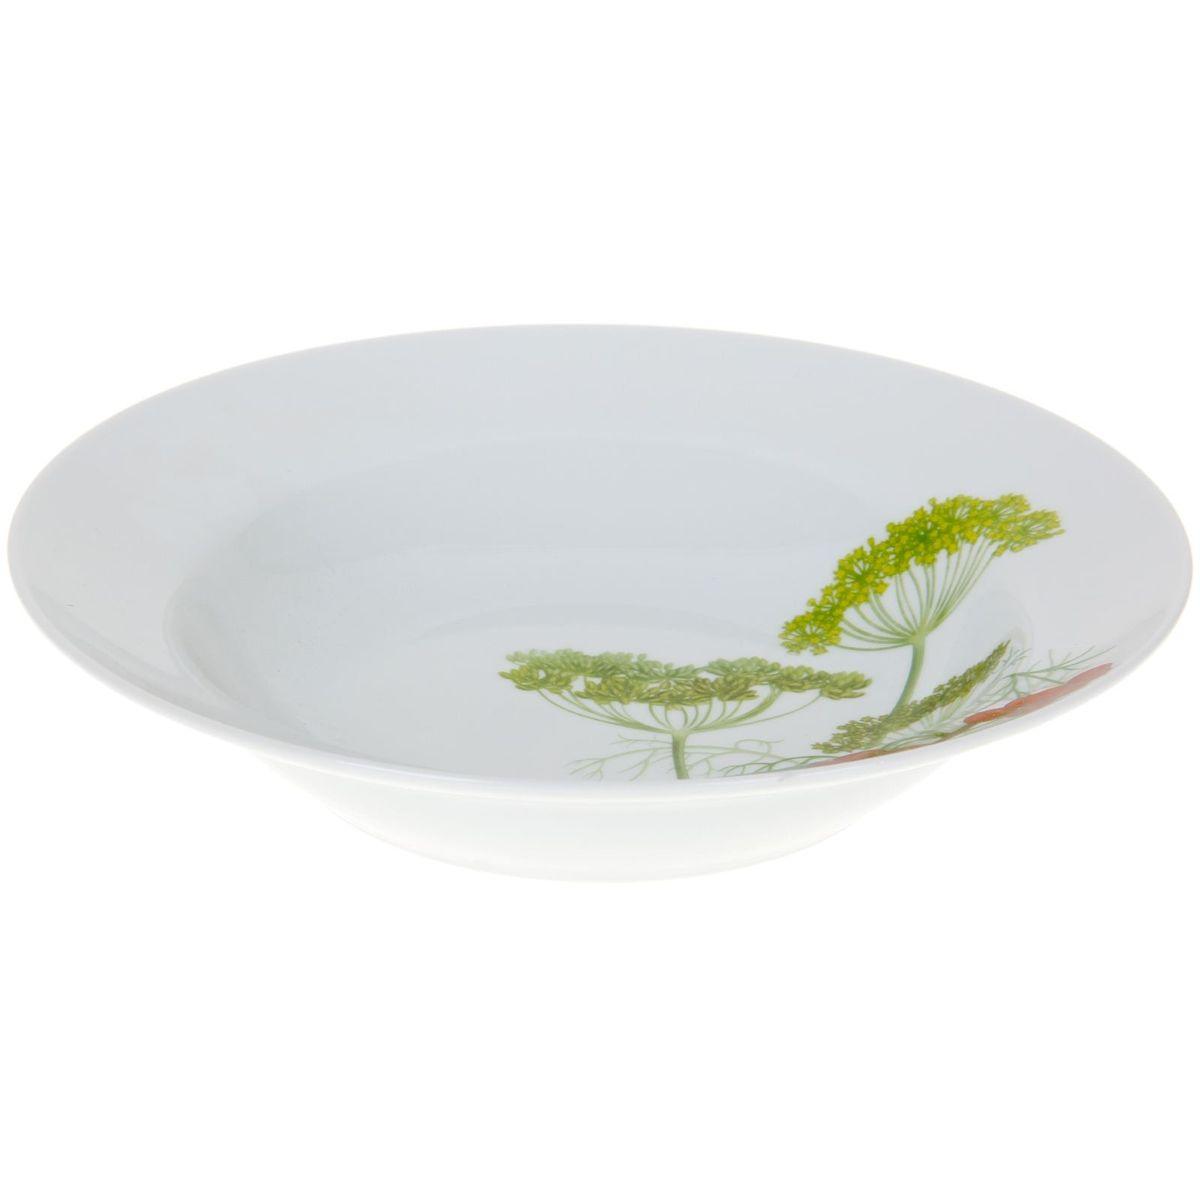 Тарелка глубокая Идиллия. Садочек, диаметр 24 см тарелка идиллия космея диаметр 24 см